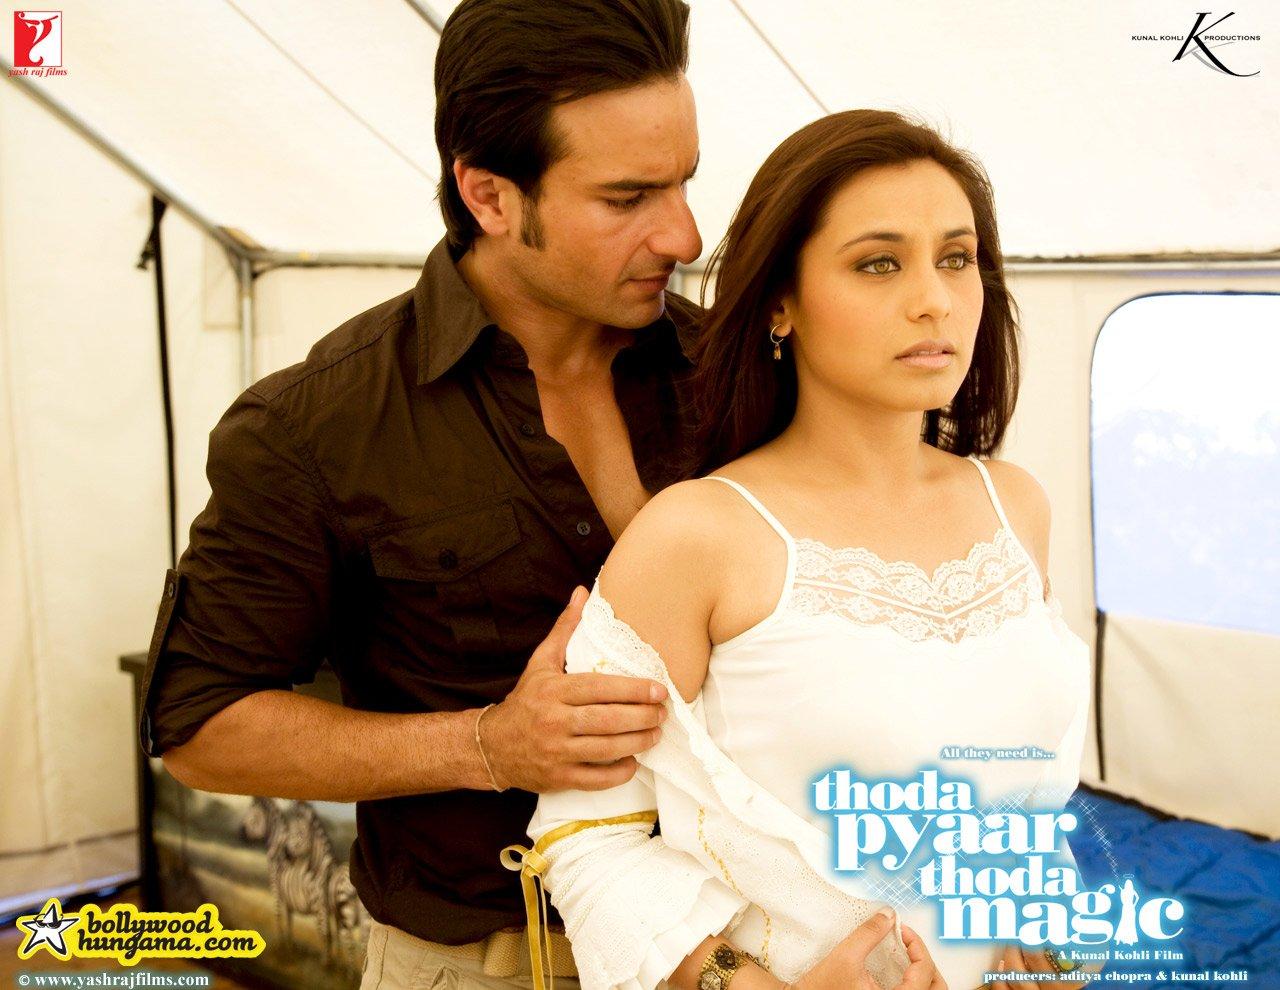 http://i.indiafm.com/posters/movies/08/thodapyaarthodamagic/still11.jpg